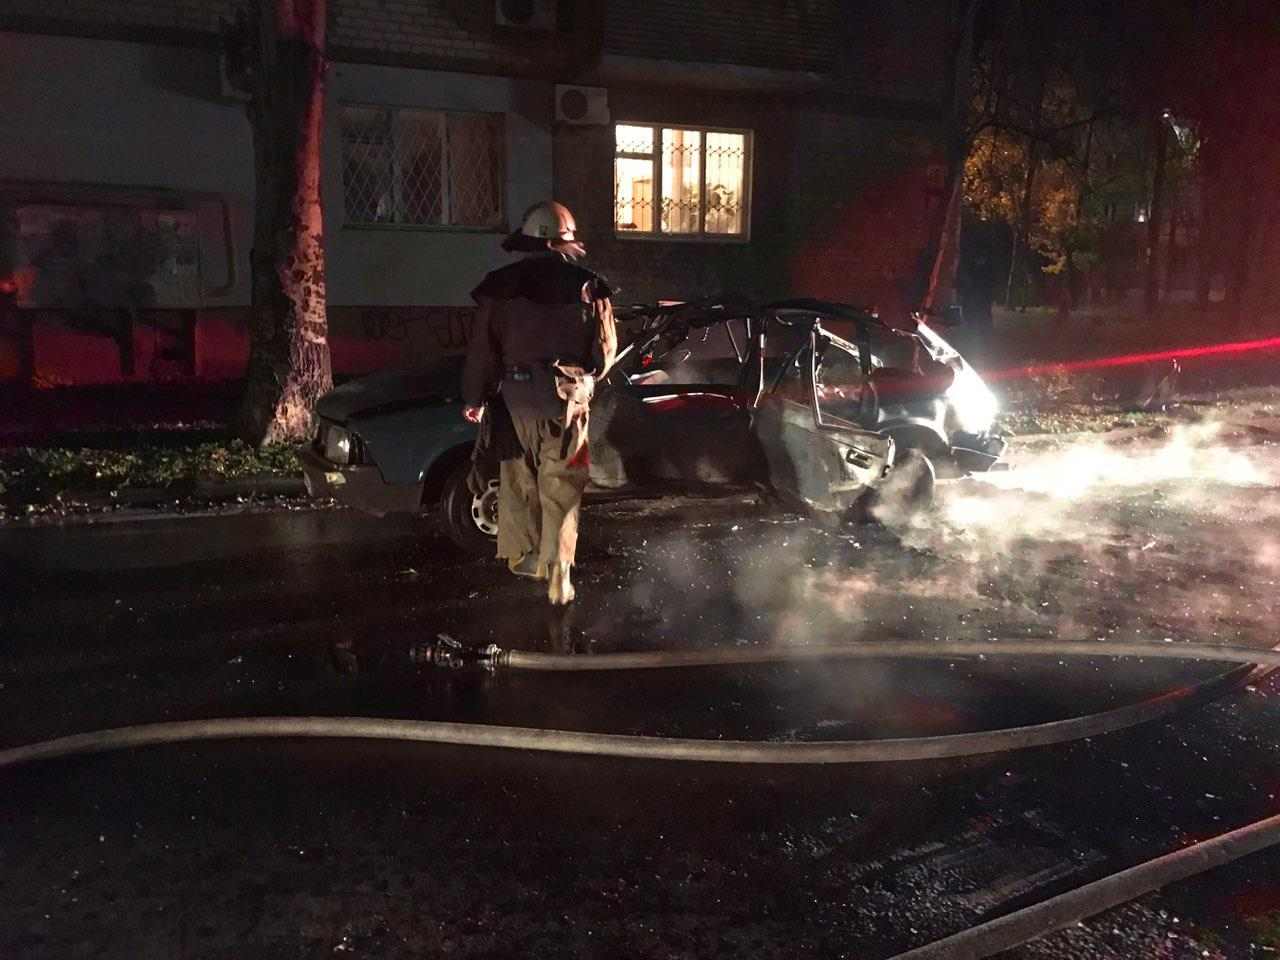 В Бердянске взорвался автомобиль - фото, видео